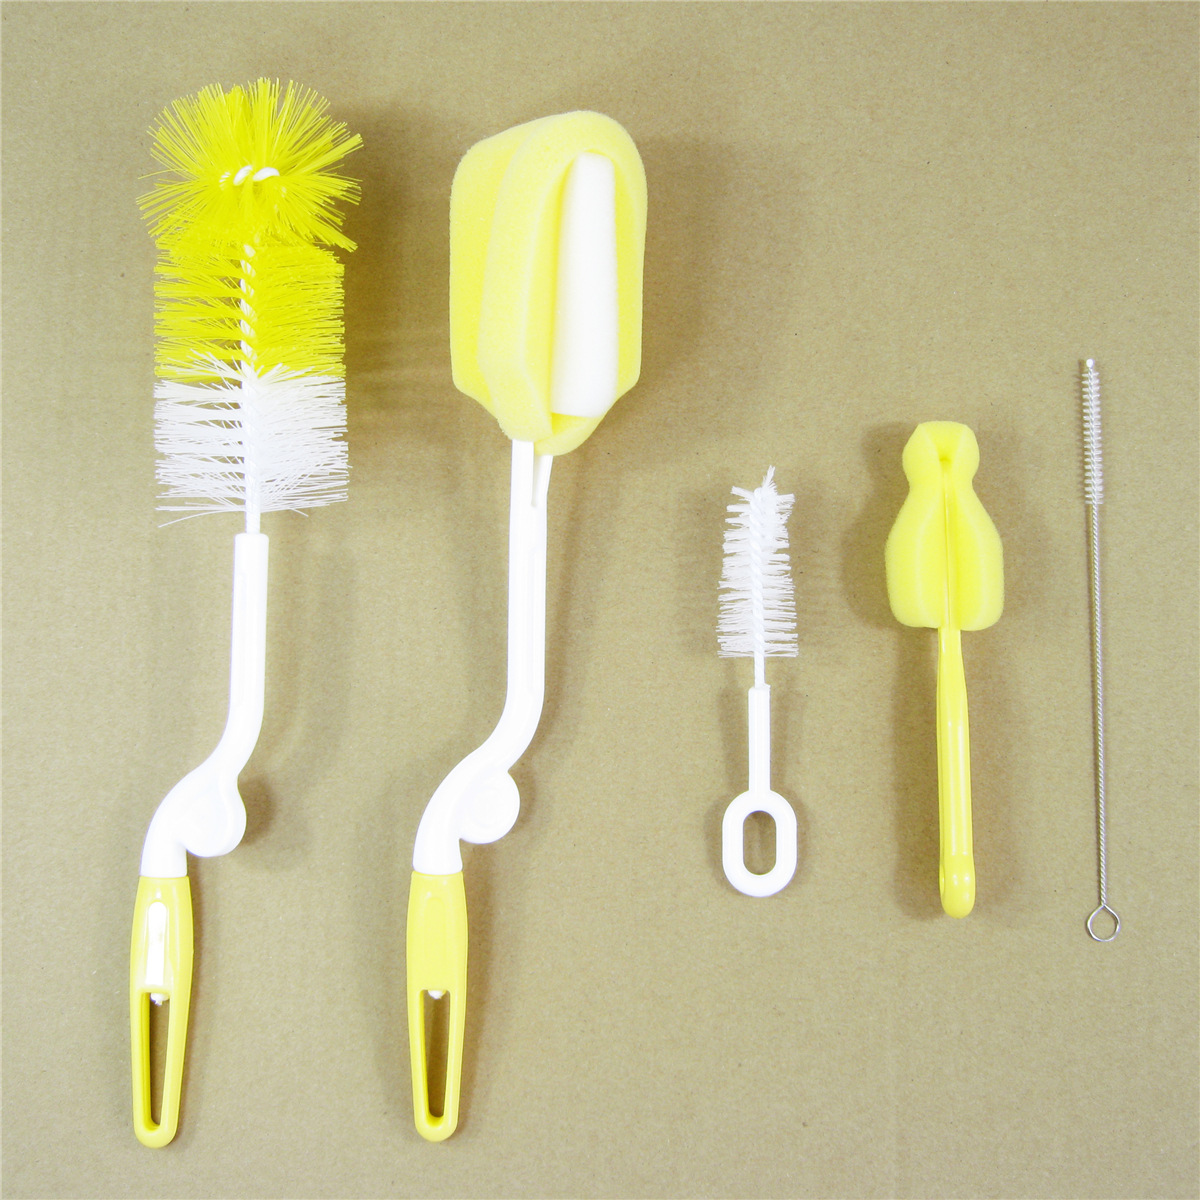 Buy  5pcs/set baby Bottle Brush sponge plastic glass cup milk clearing newborn feeding nipple straw moth